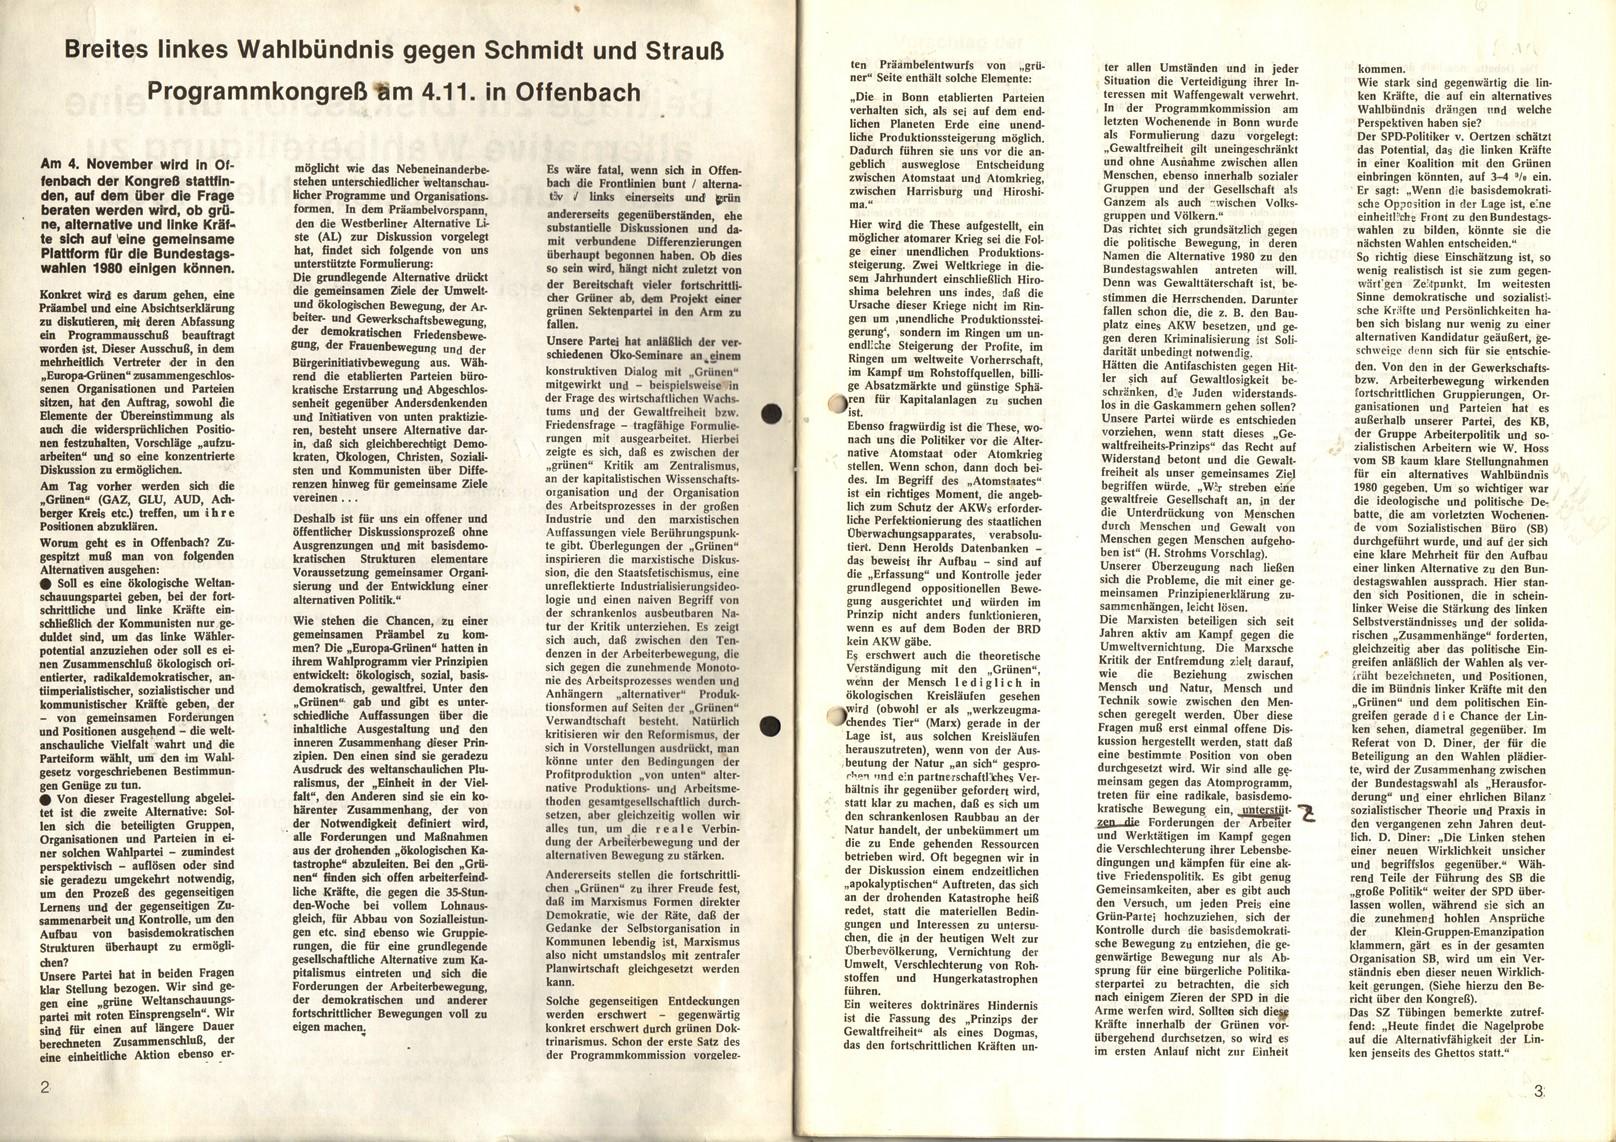 KPDAO_1979_Diskussion_Bundestagswahlen_1980_02